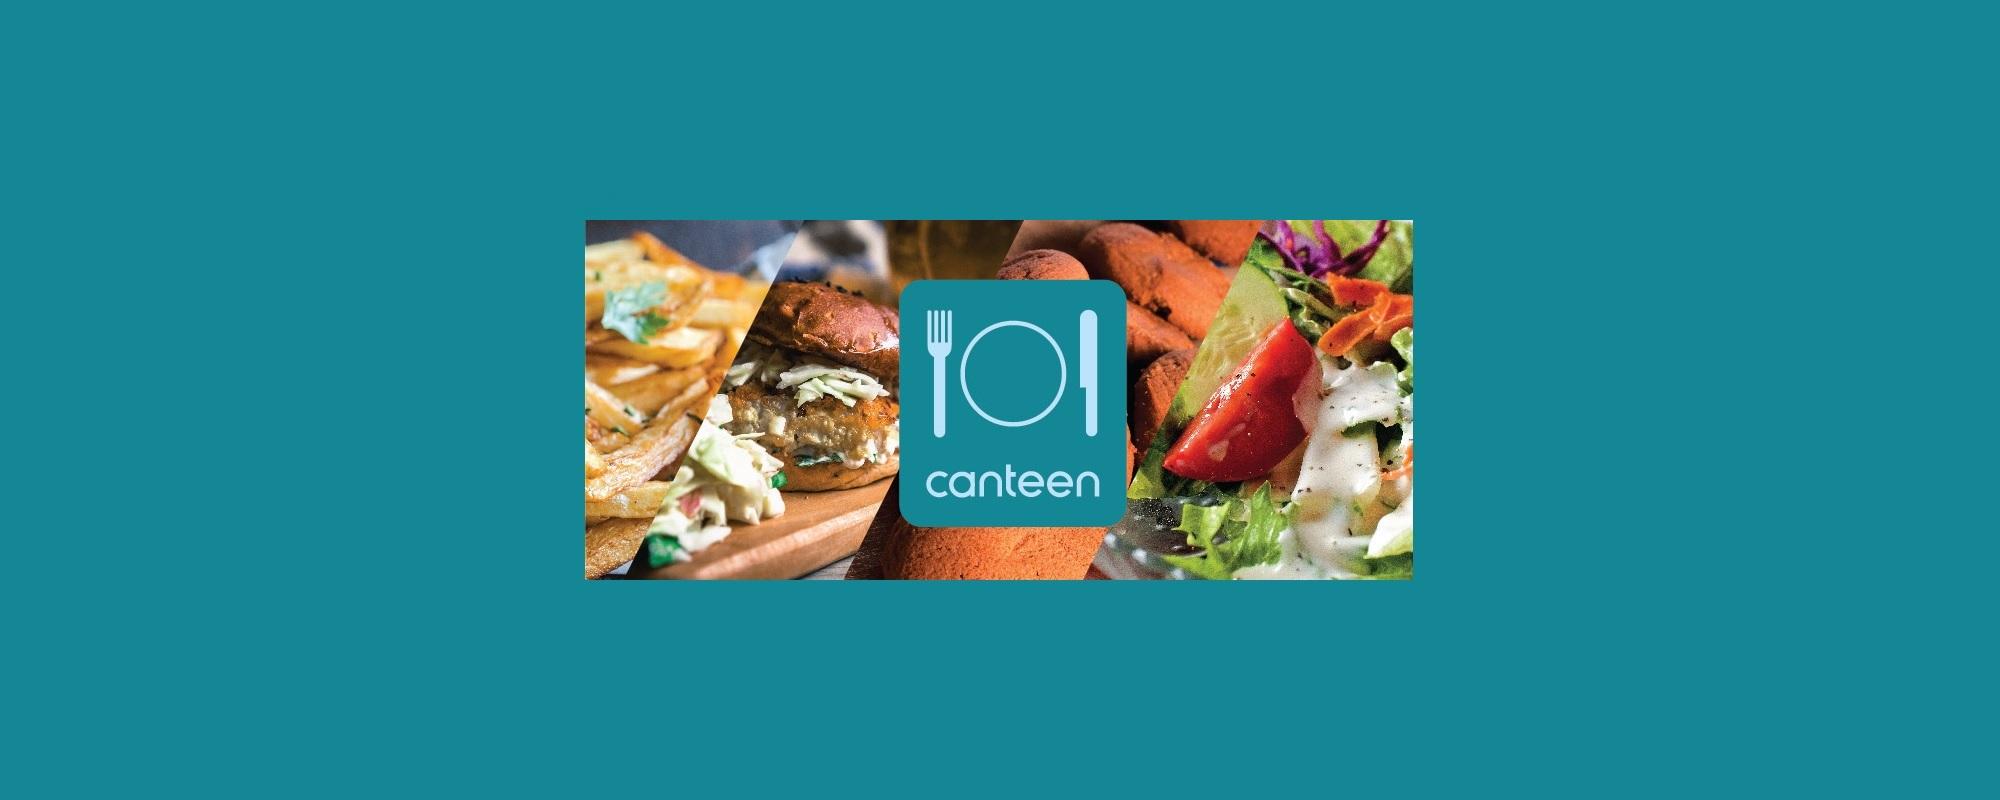 Canteen-HomePageBannerMain